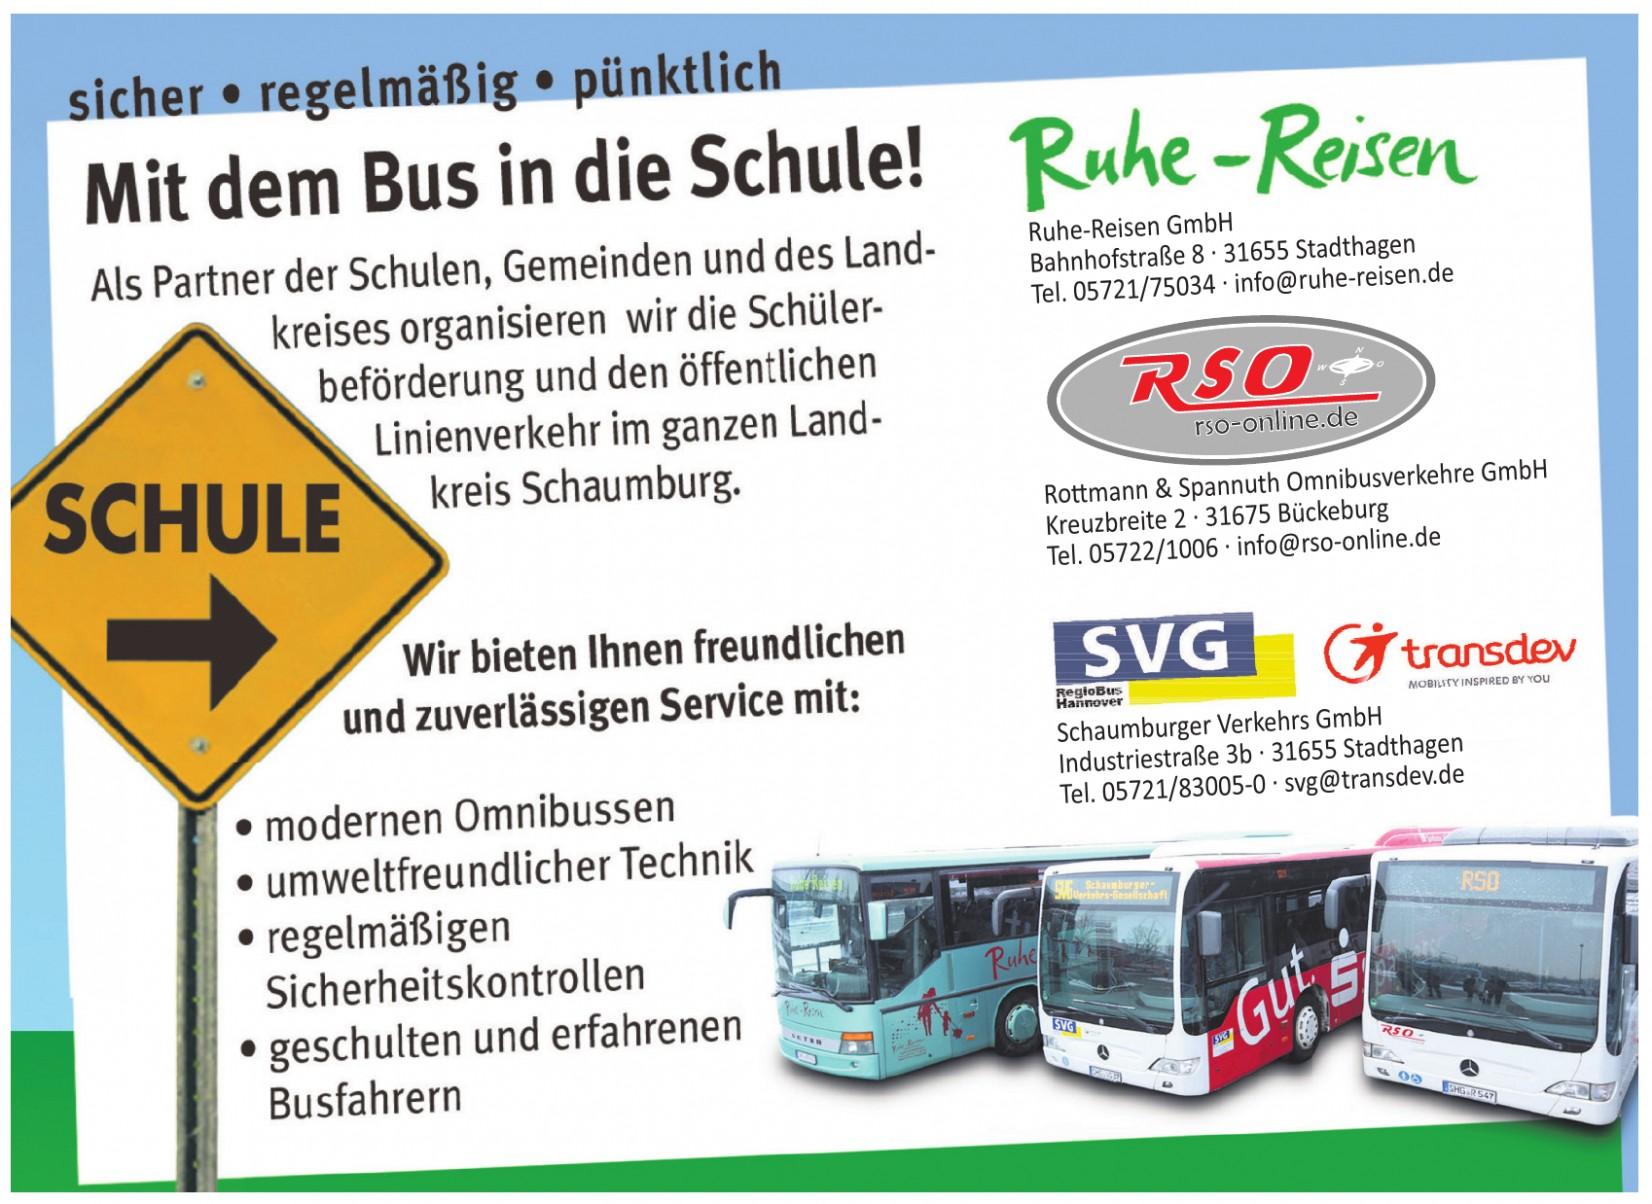 Ruhe-Reisen GmbH